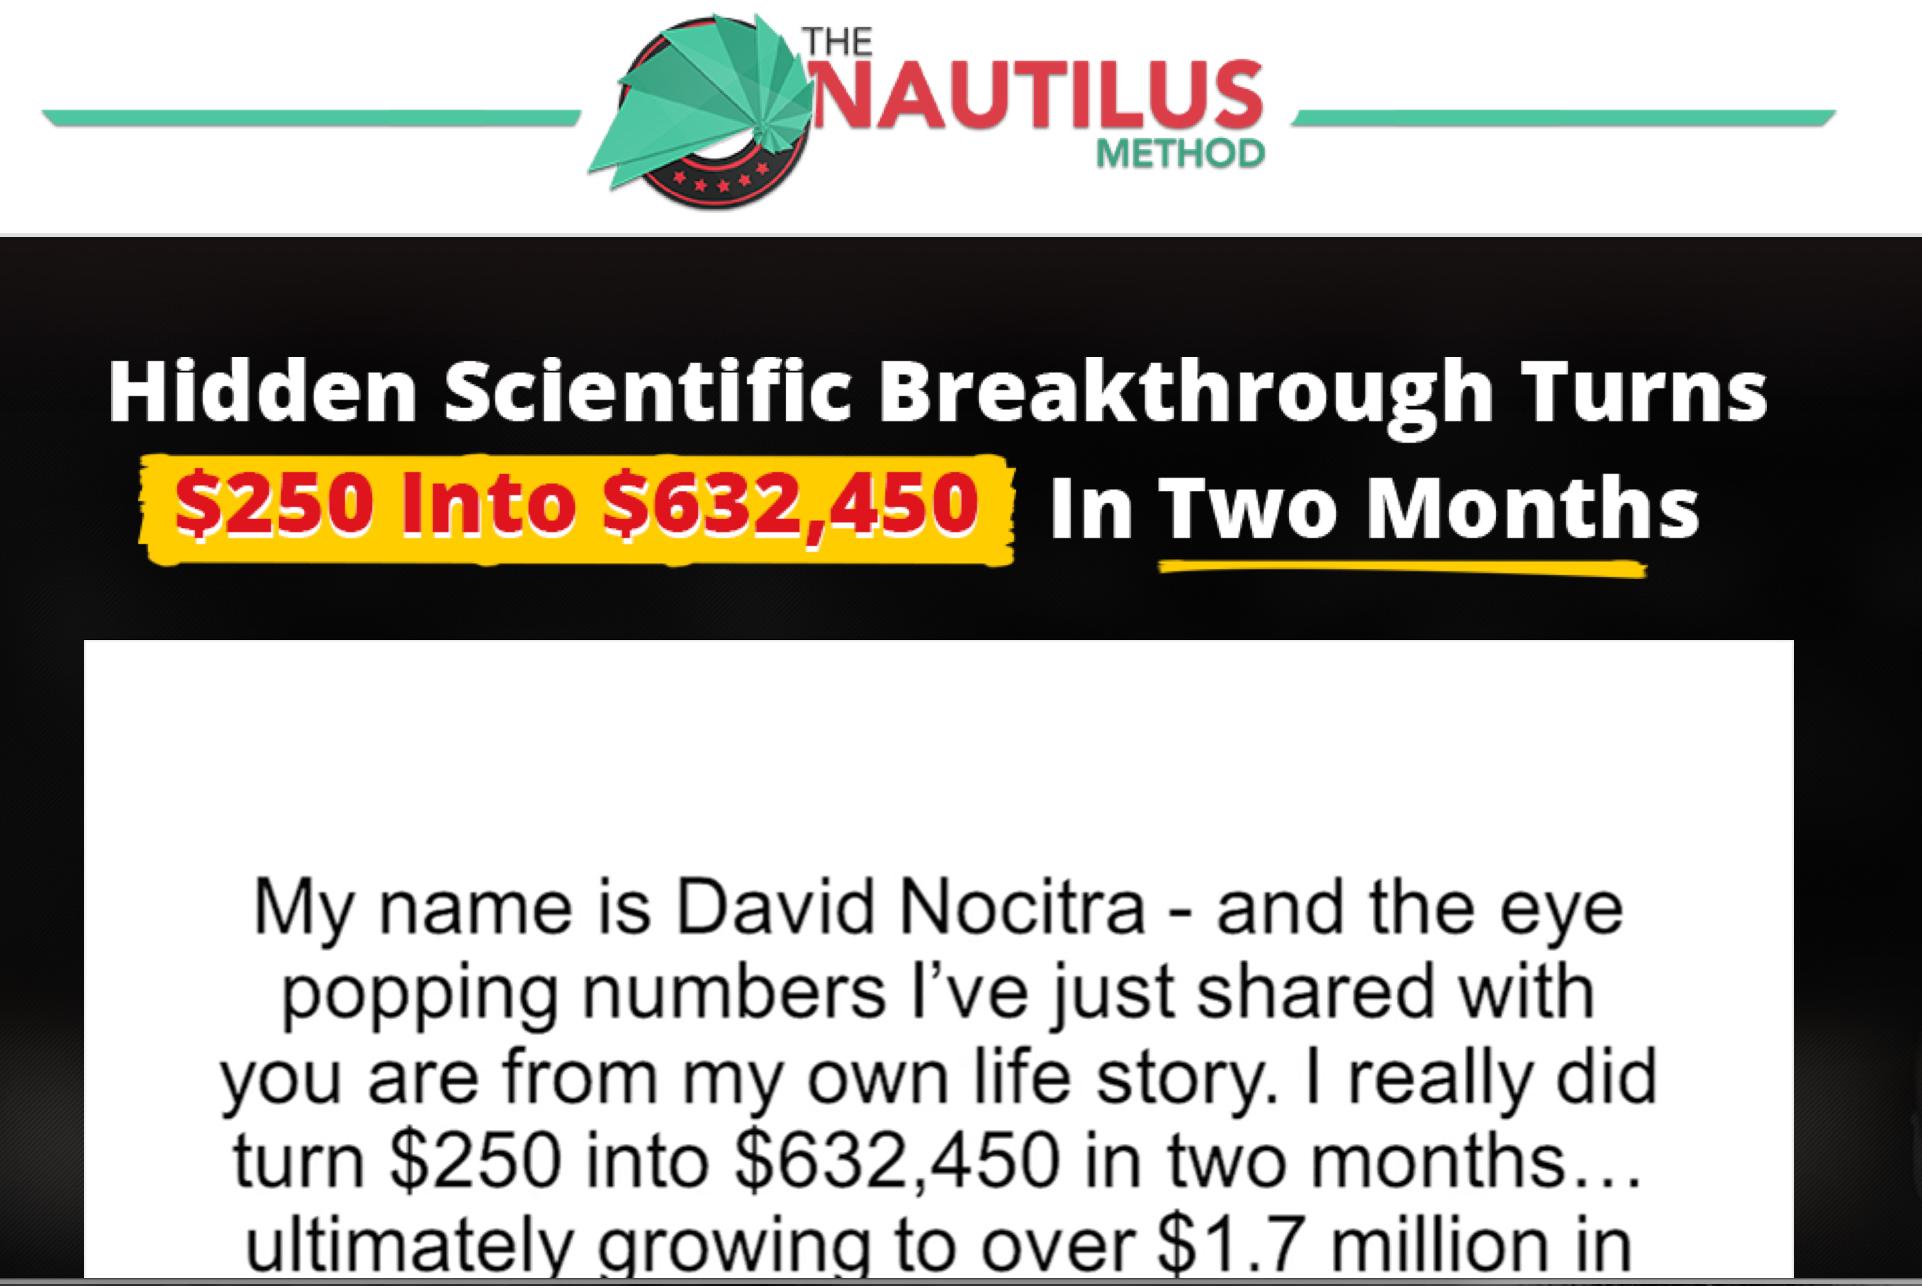 Nautilus Method Review